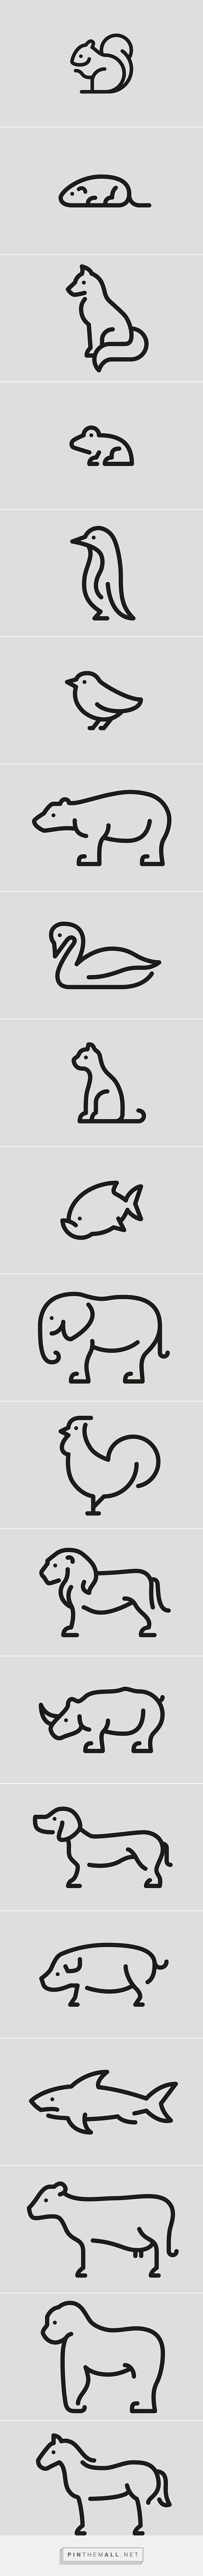 Animal Pictograms on Behance: